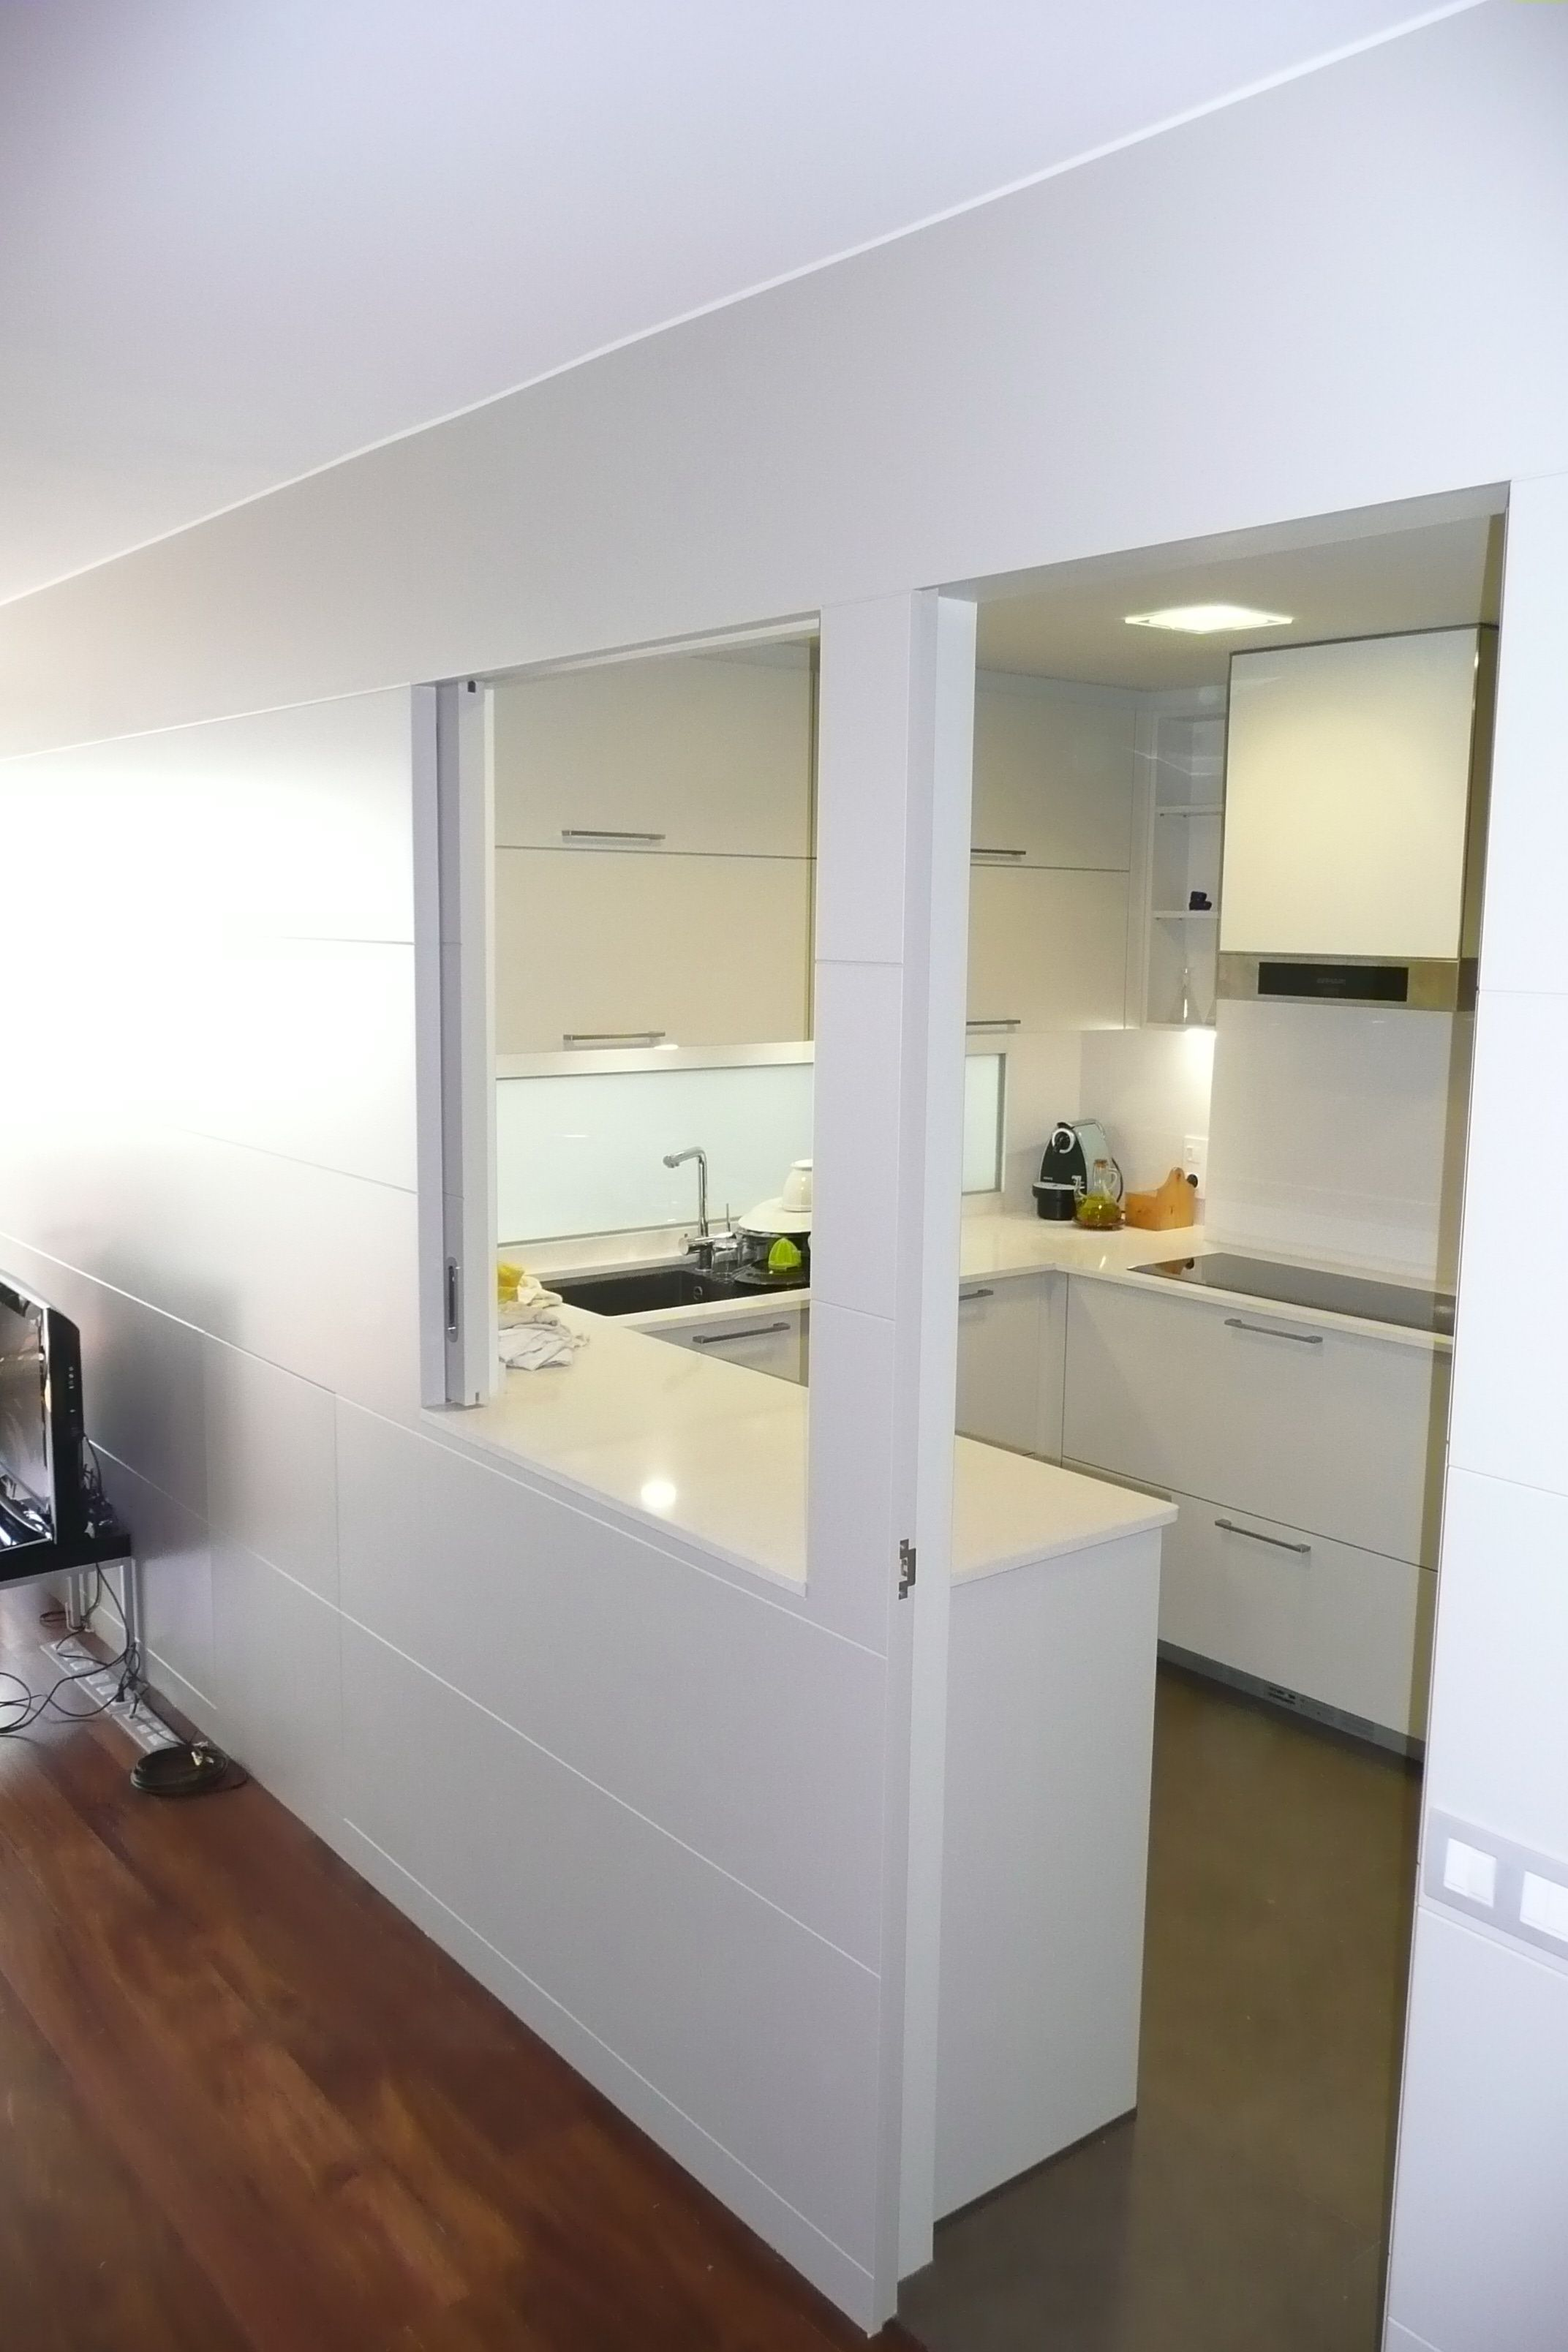 Cocina santos modelo ariane2 blanco seff con apertura for Ver modelos de muebles de cocina